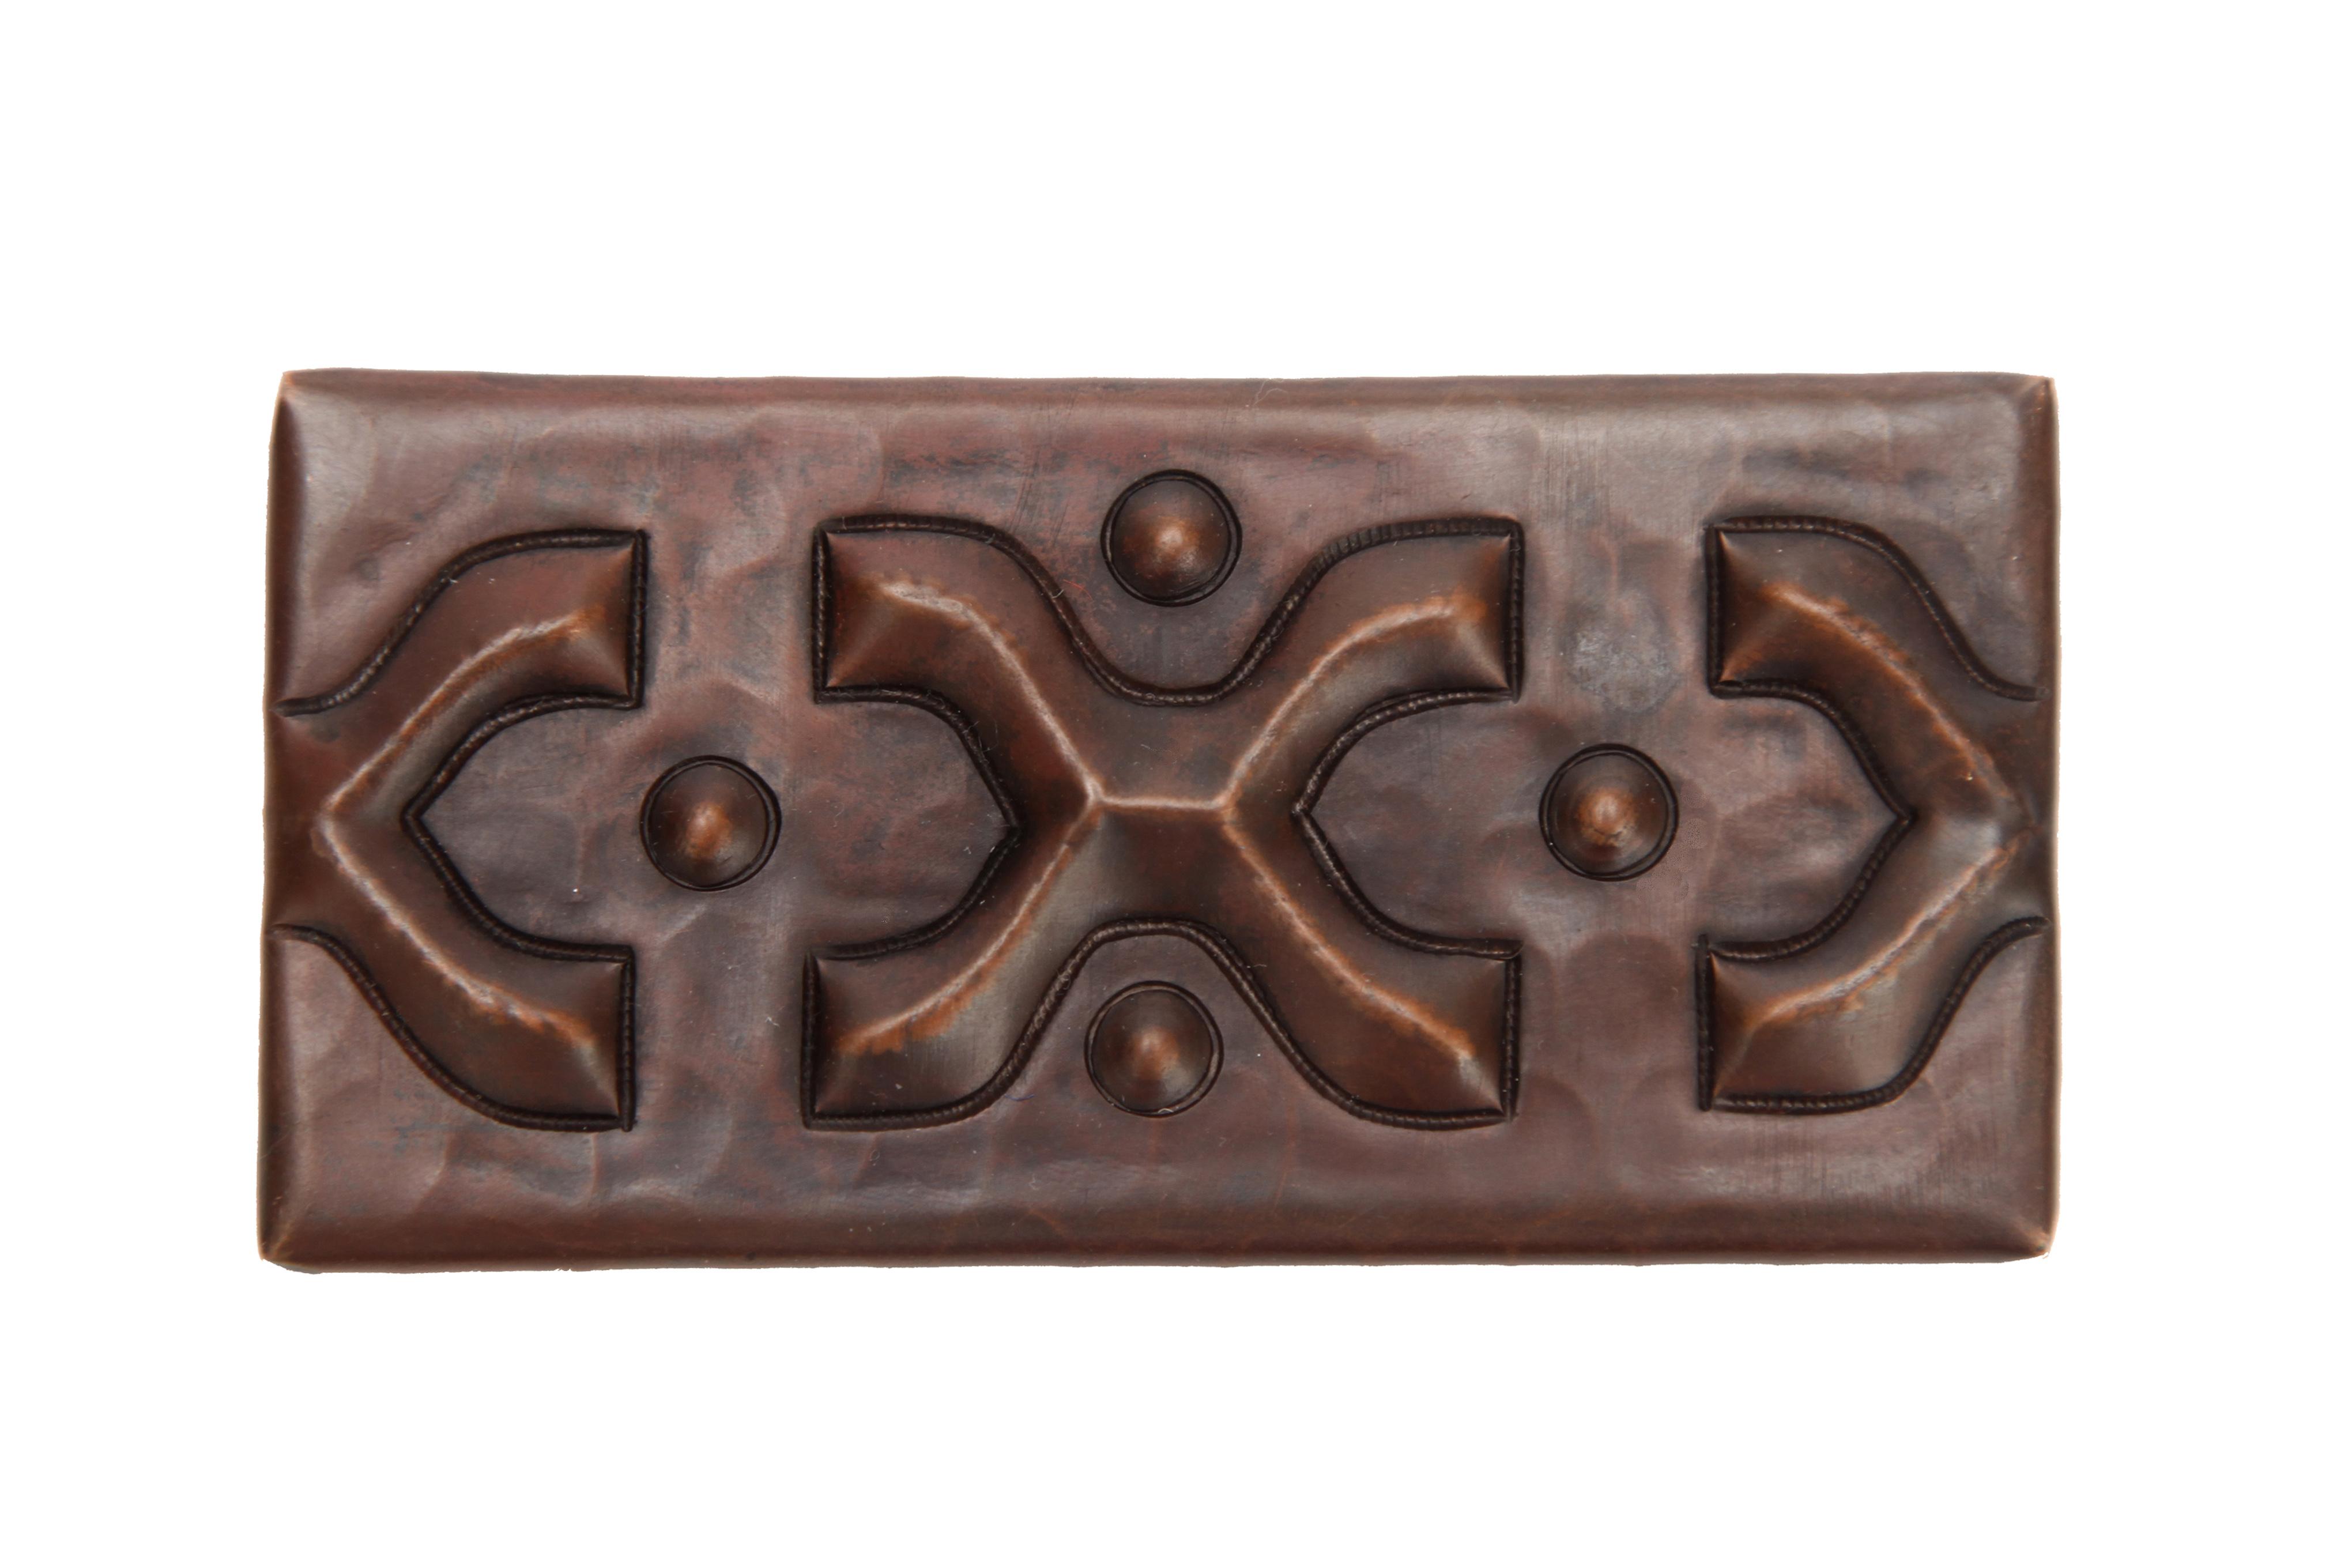 Picture of Copper Liner Tile - X Design by SoLuna